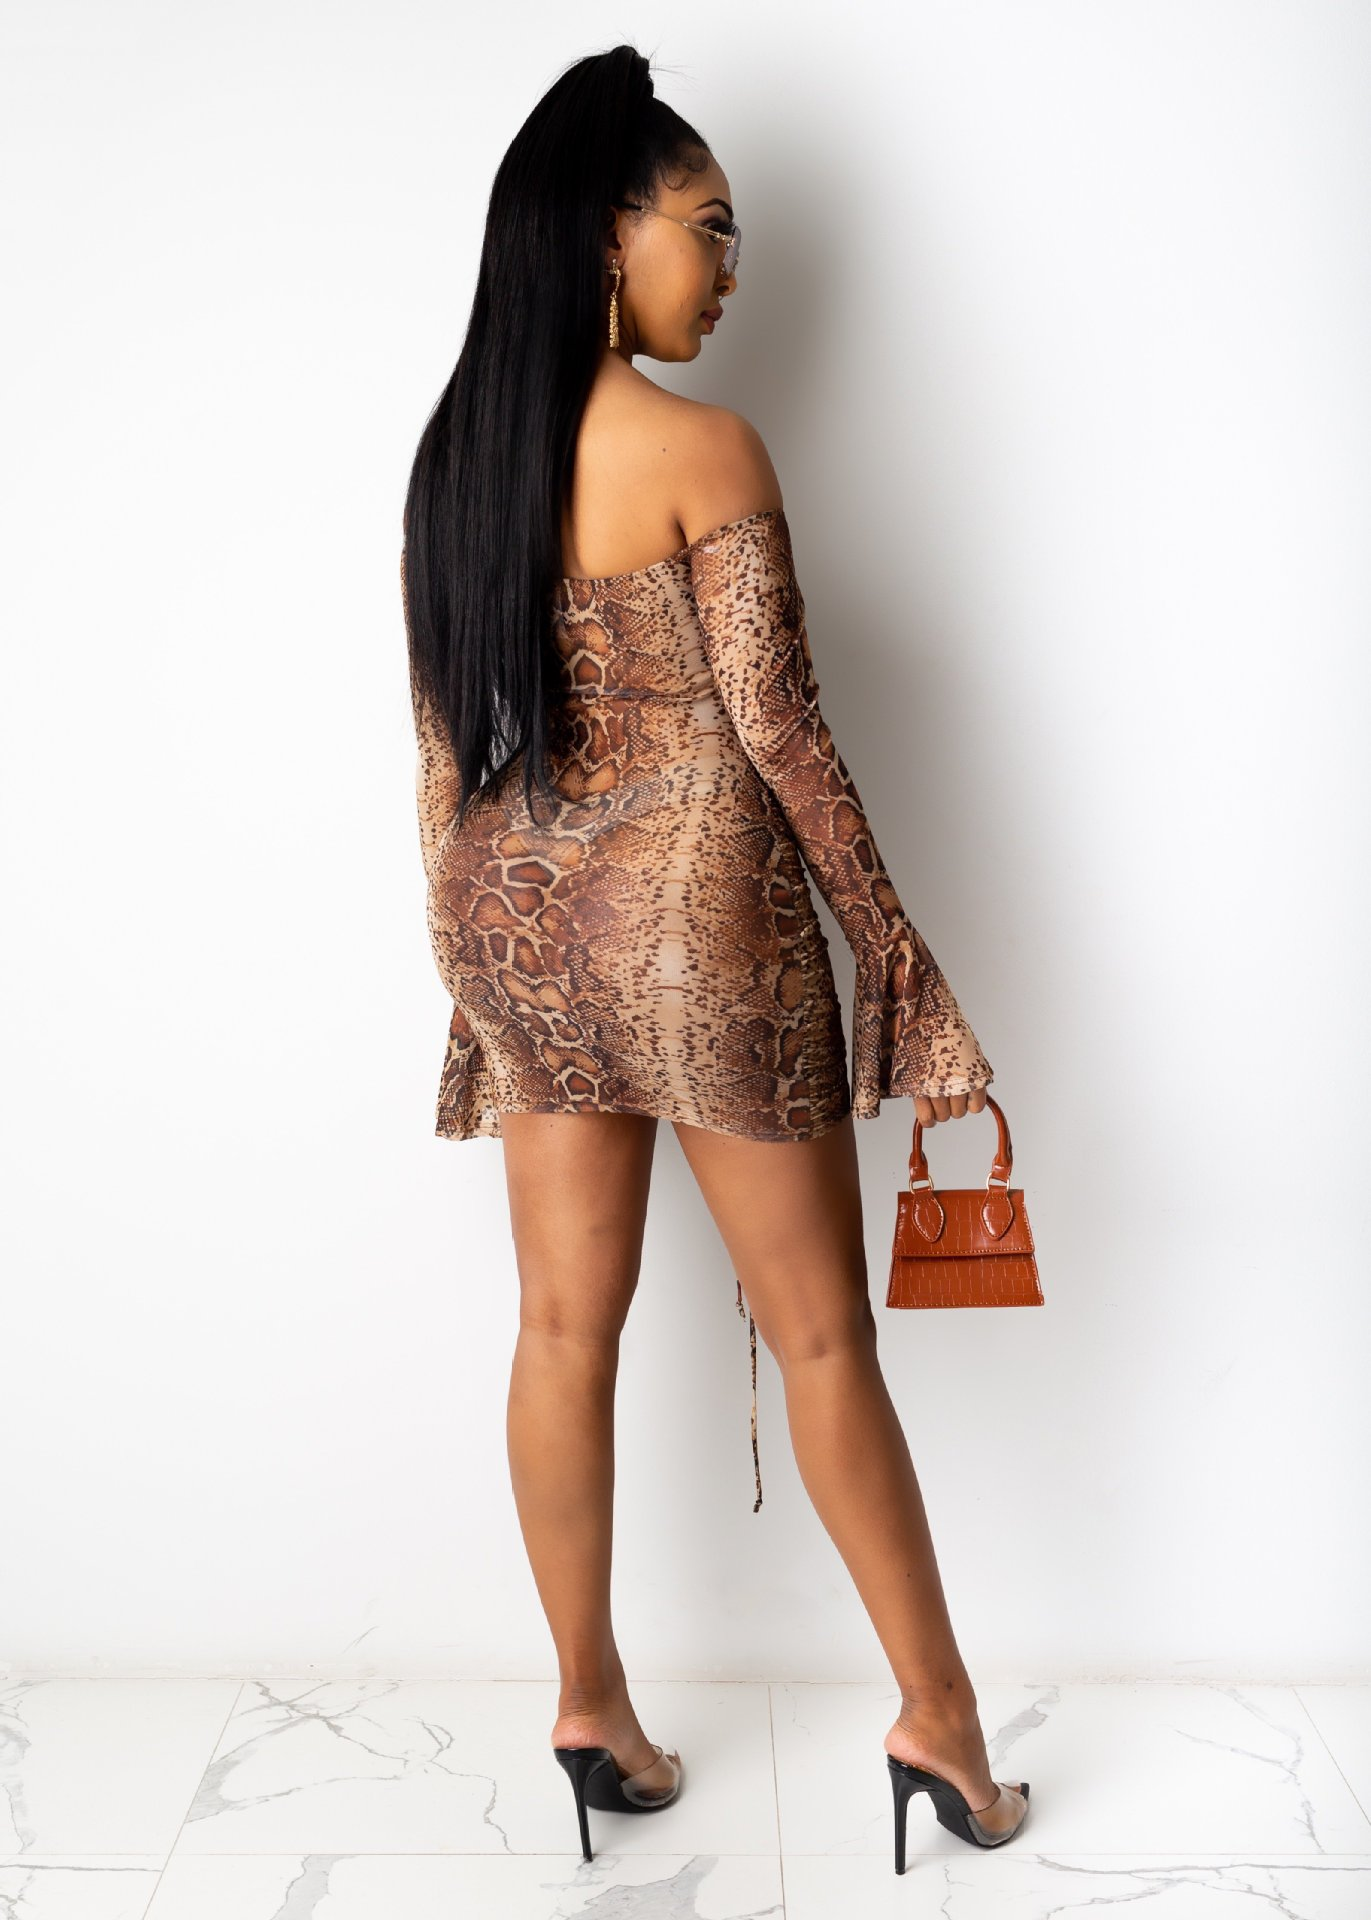 H1b50b74d7c854076b21fd61a46408ec0w - Adogirl Snake Print Long Sleeve Dress Women Evening Party Night Dresses Sexy Off Shoulder Drawstring Bodycon Slim Mini Dress